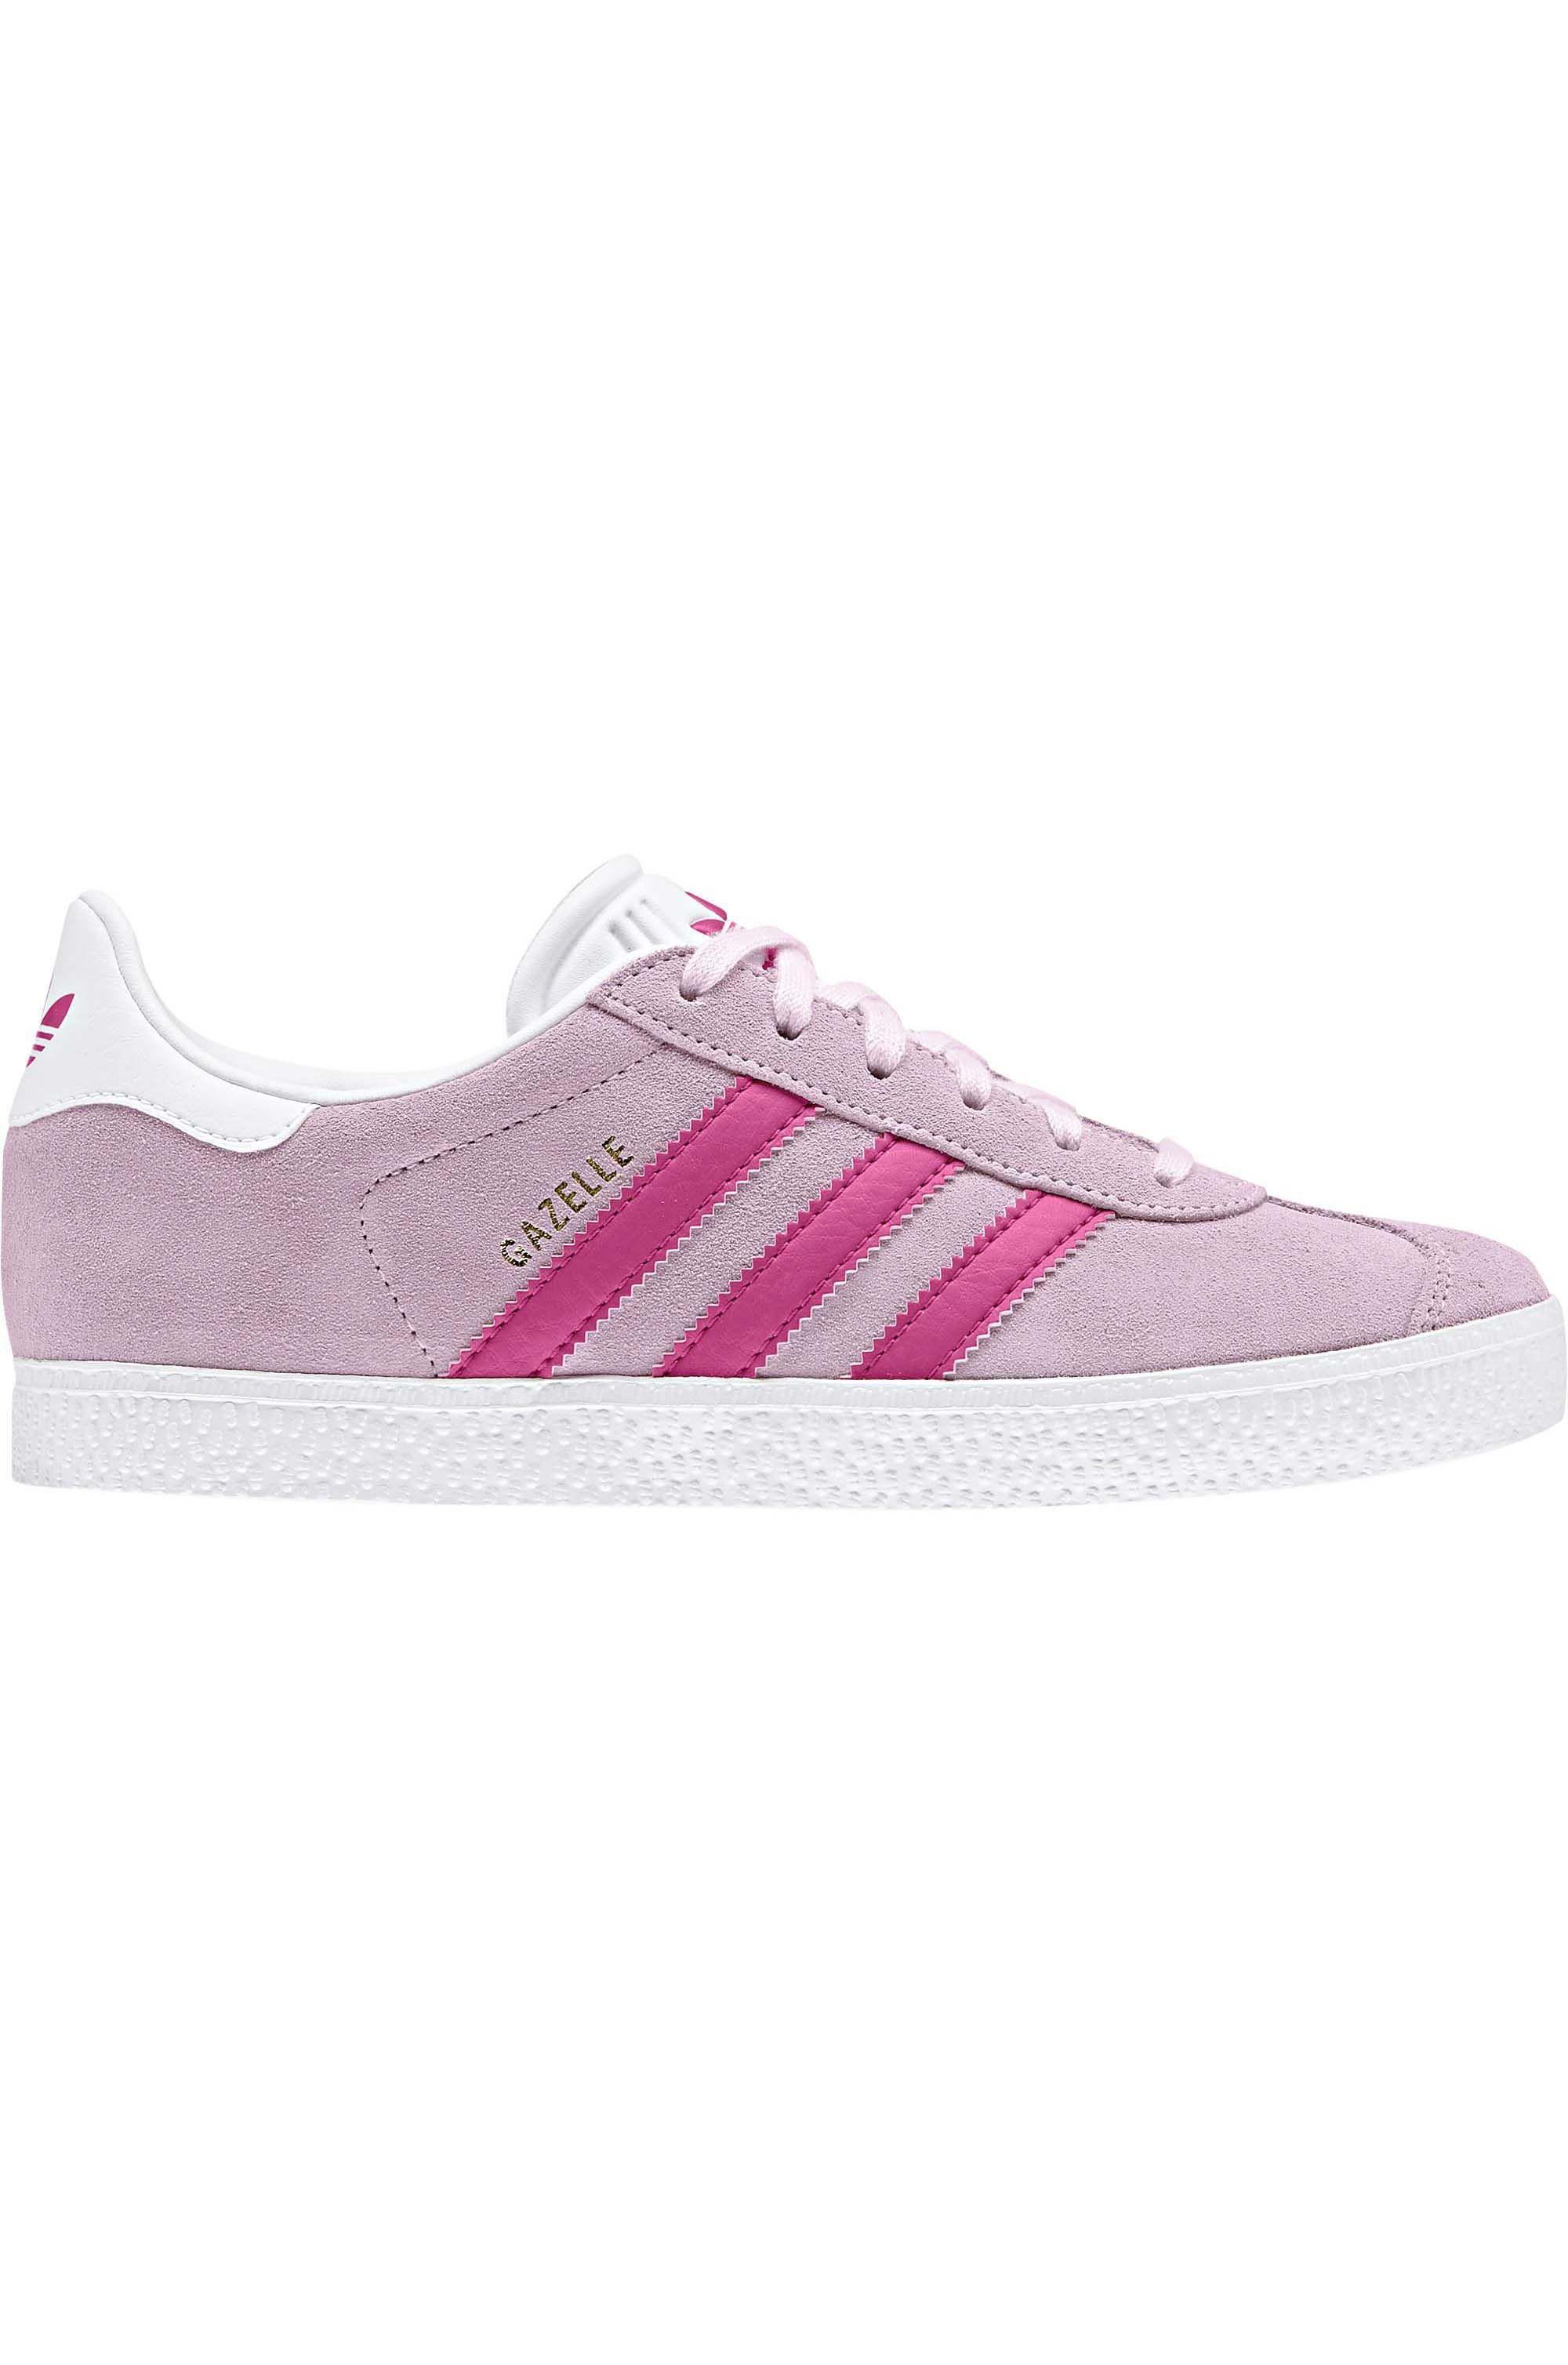 Tenis Adidas GAZELLE J Clear Pink/Real Magenta/Ftwr White